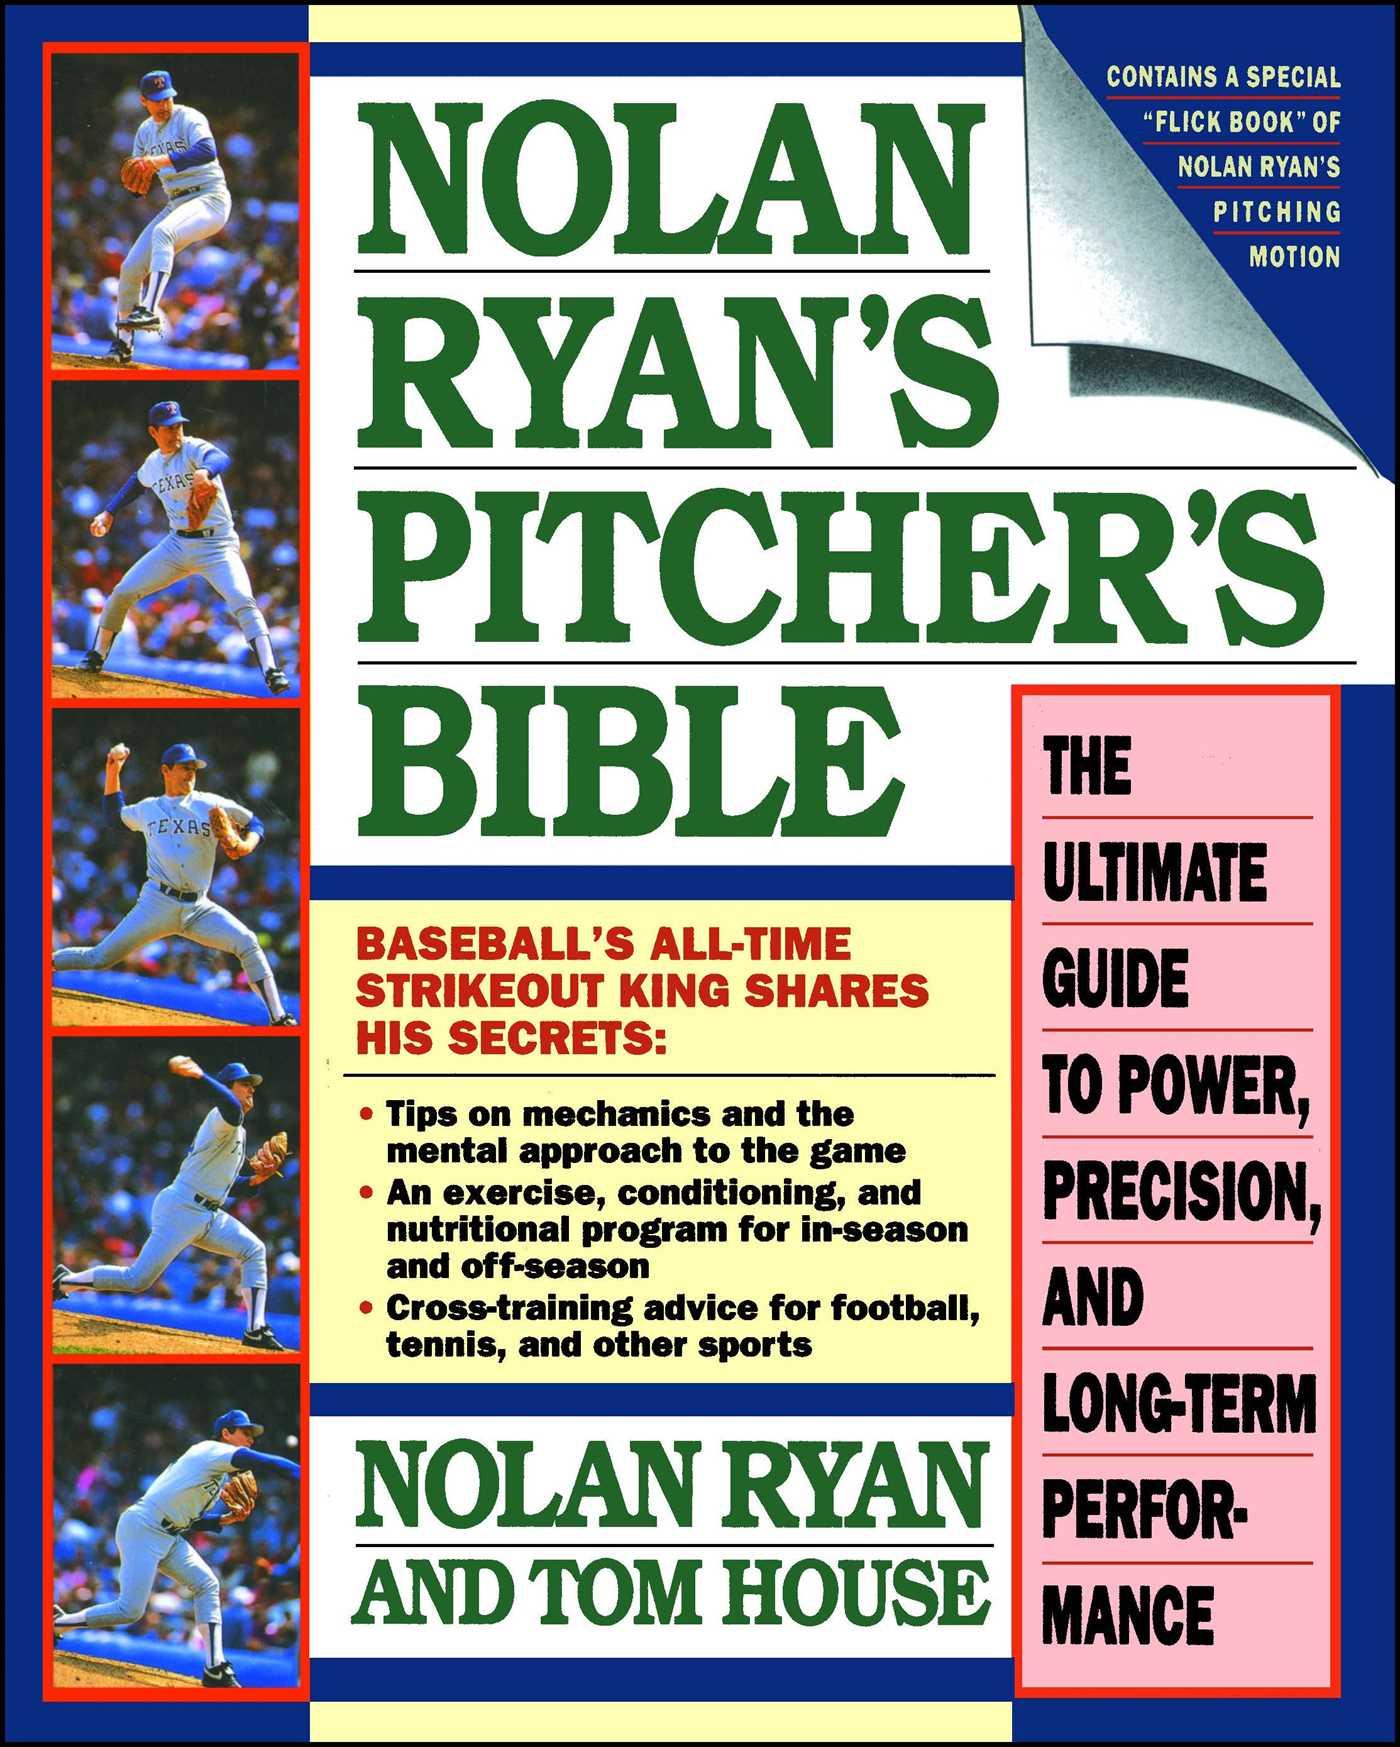 Nolan ryans pitchers bible 9780671705817 hr